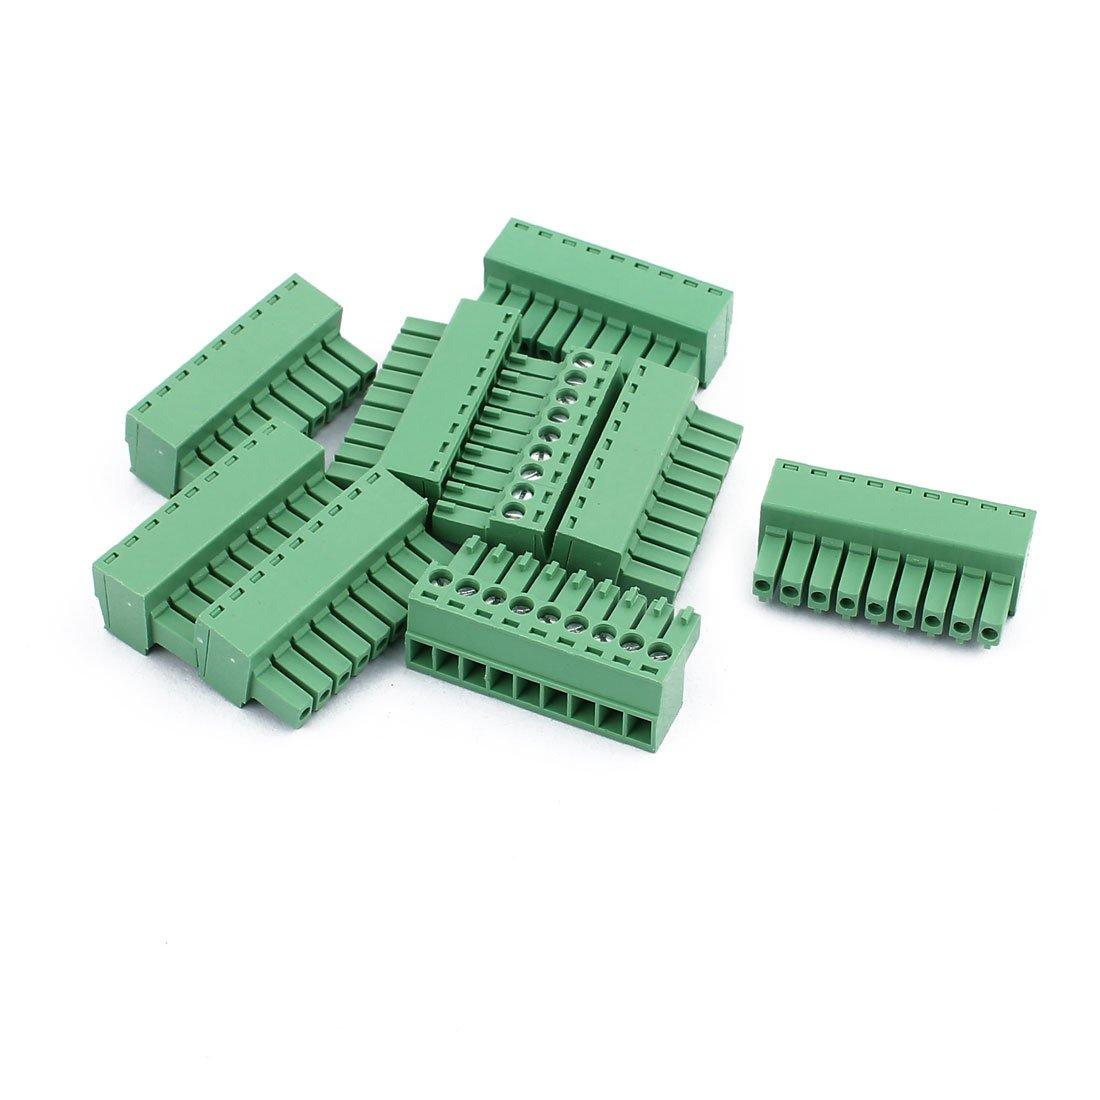 5Pcs 300V KF2EDGK 3.5mm Pitch 16-Pin PCB Screw Terminal Block Connector